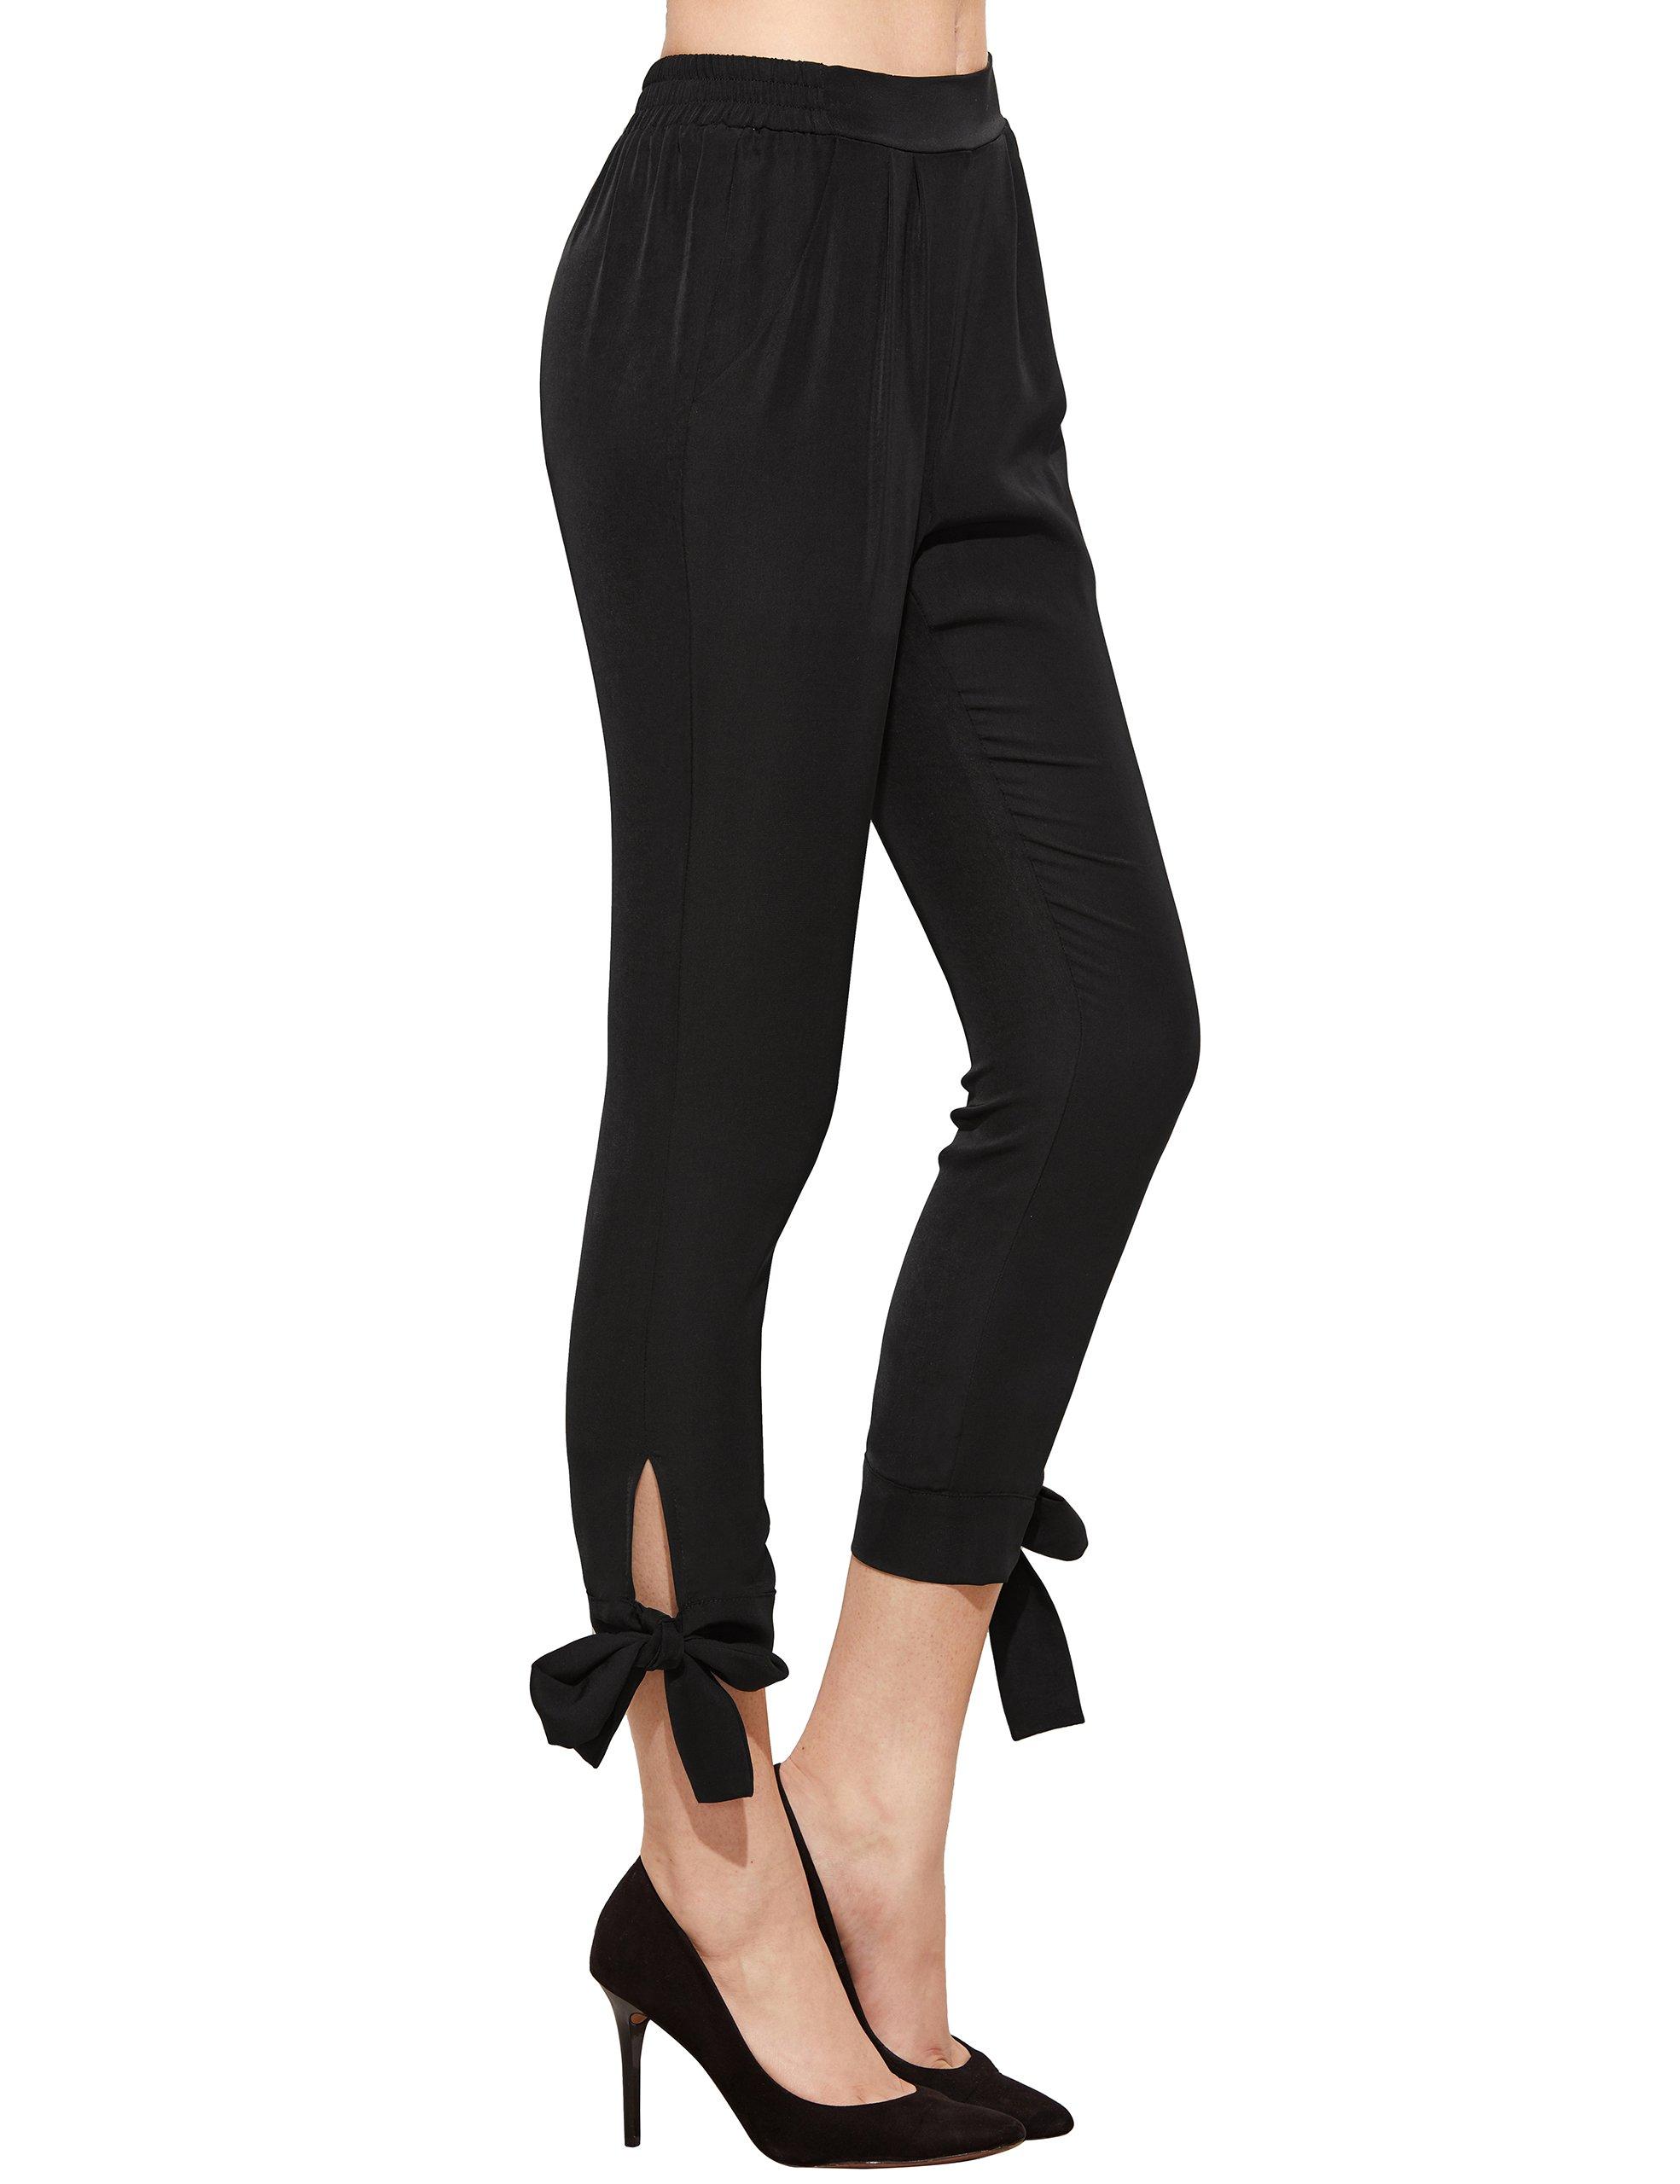 SheIn Women's Elastic Waist Comfy Bow Tie Hem Crop Skinny Pants with Pockets Small Black by SheIn (Image #4)